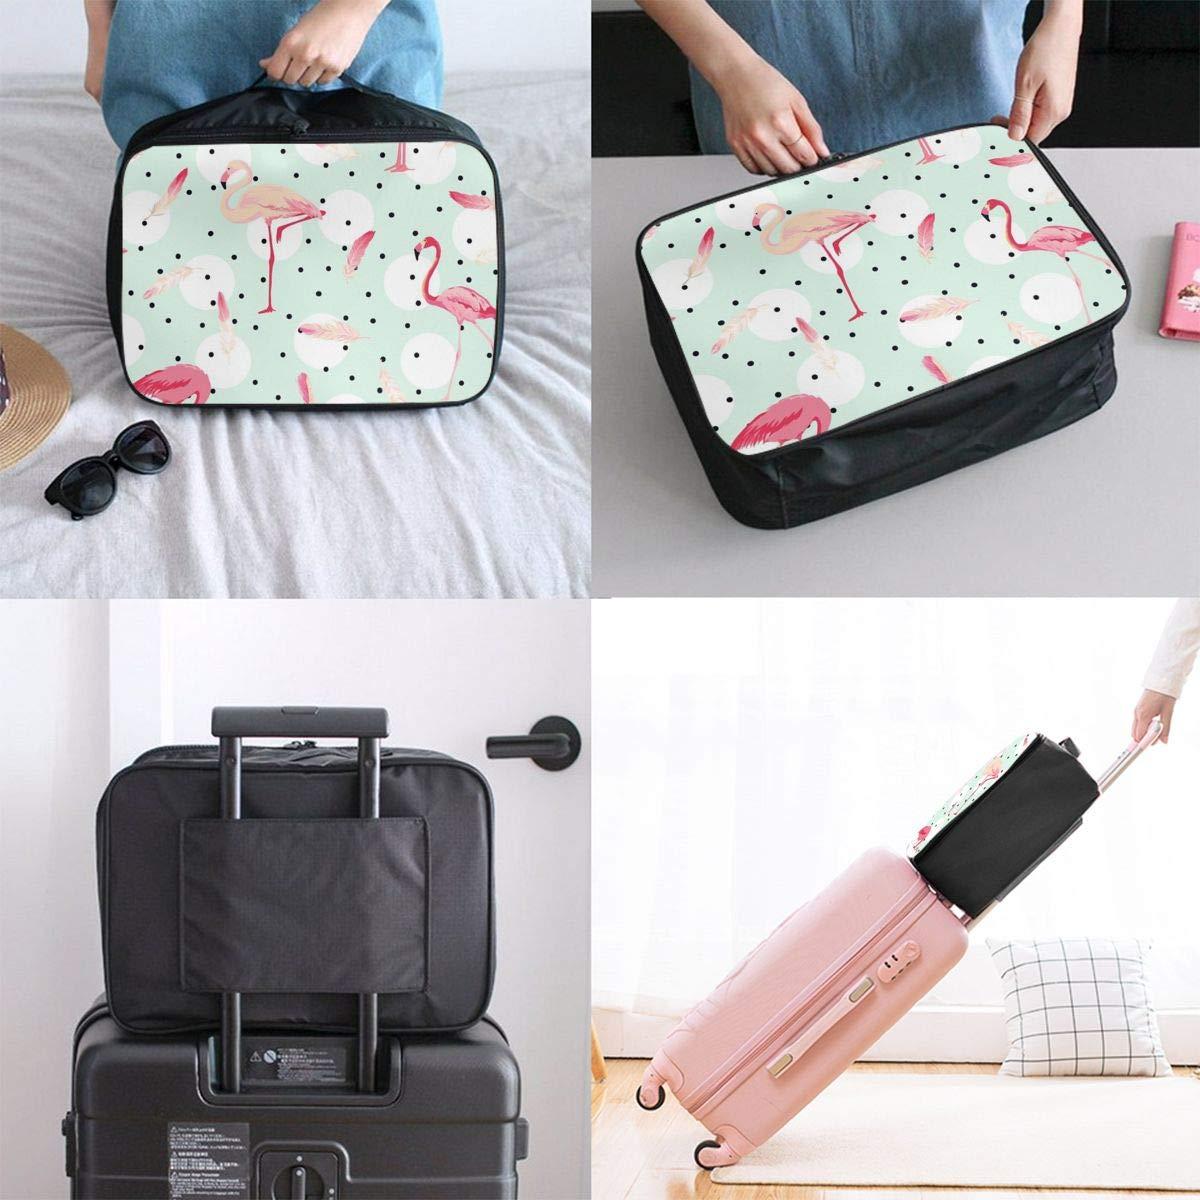 ADGAI Flamingo Dot Feather Canvas Travel Weekender Bag,Fashion Custom Lightweight Large Capacity Portable Luggage Bag,Suitcase Trolley Bag